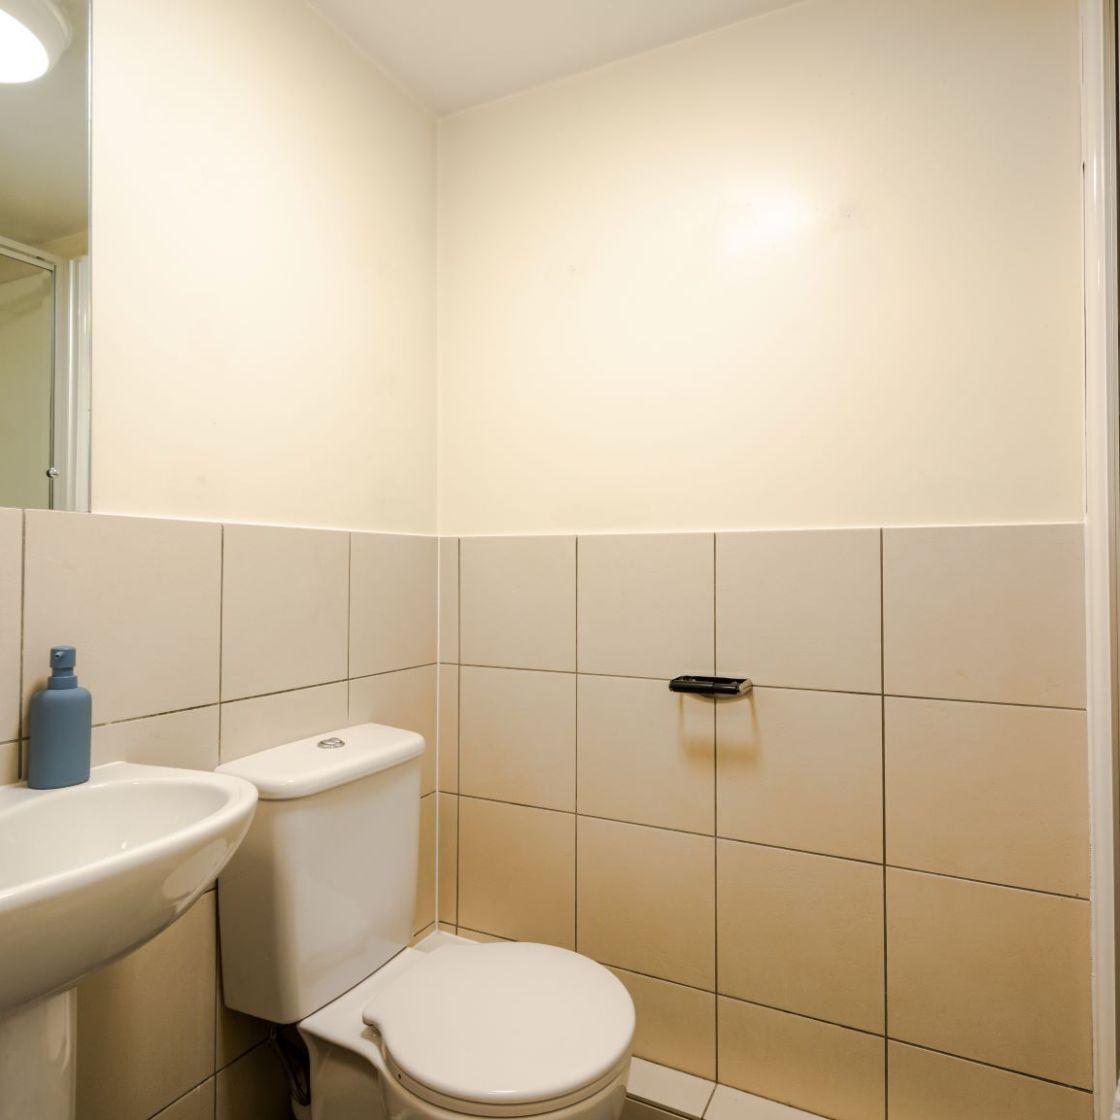 Standard student apartment in Leeds, En-suite bathroom. IconInc, Triangle.